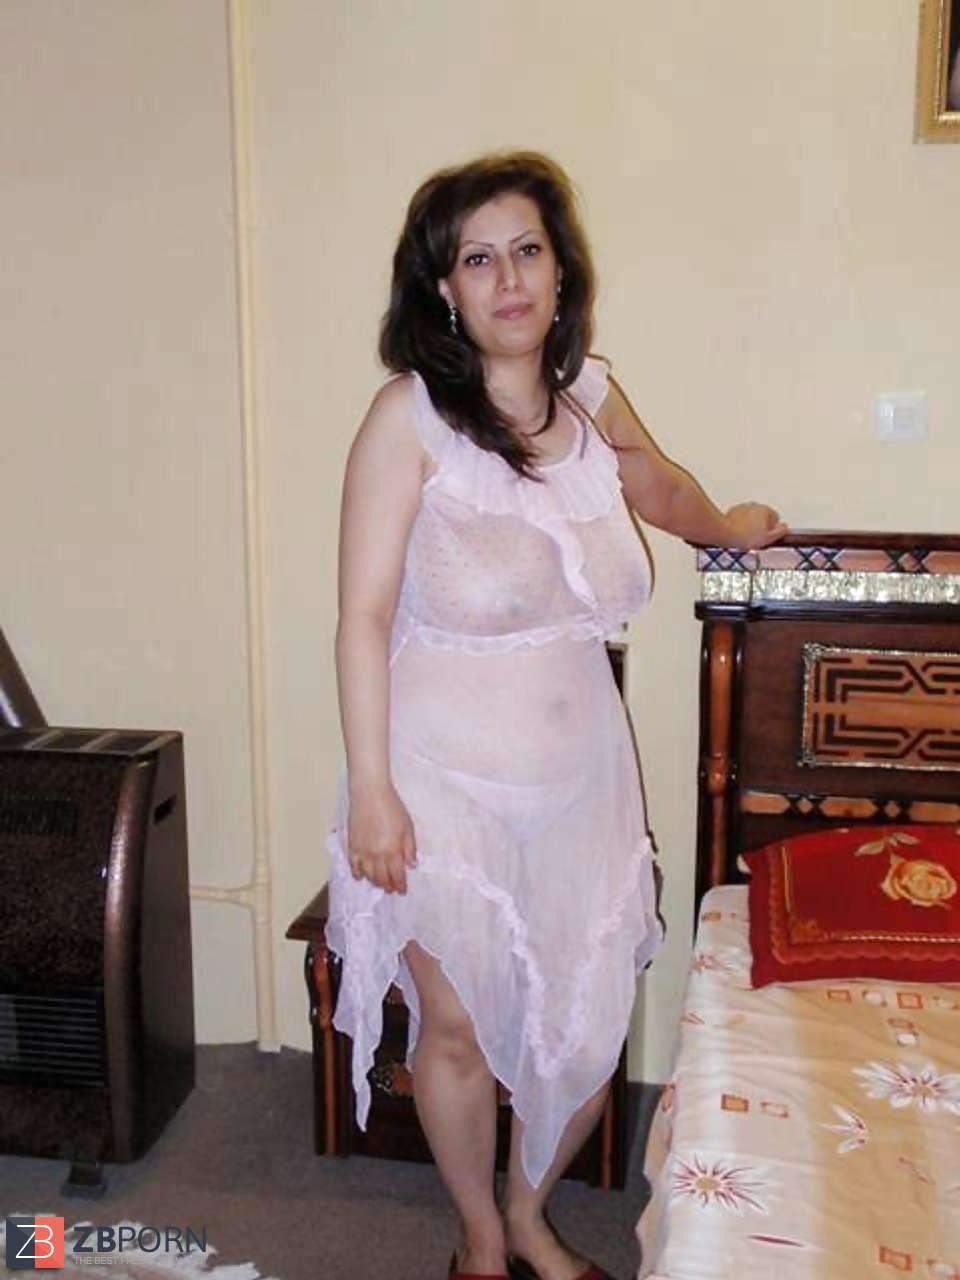 Nude girl pregnant